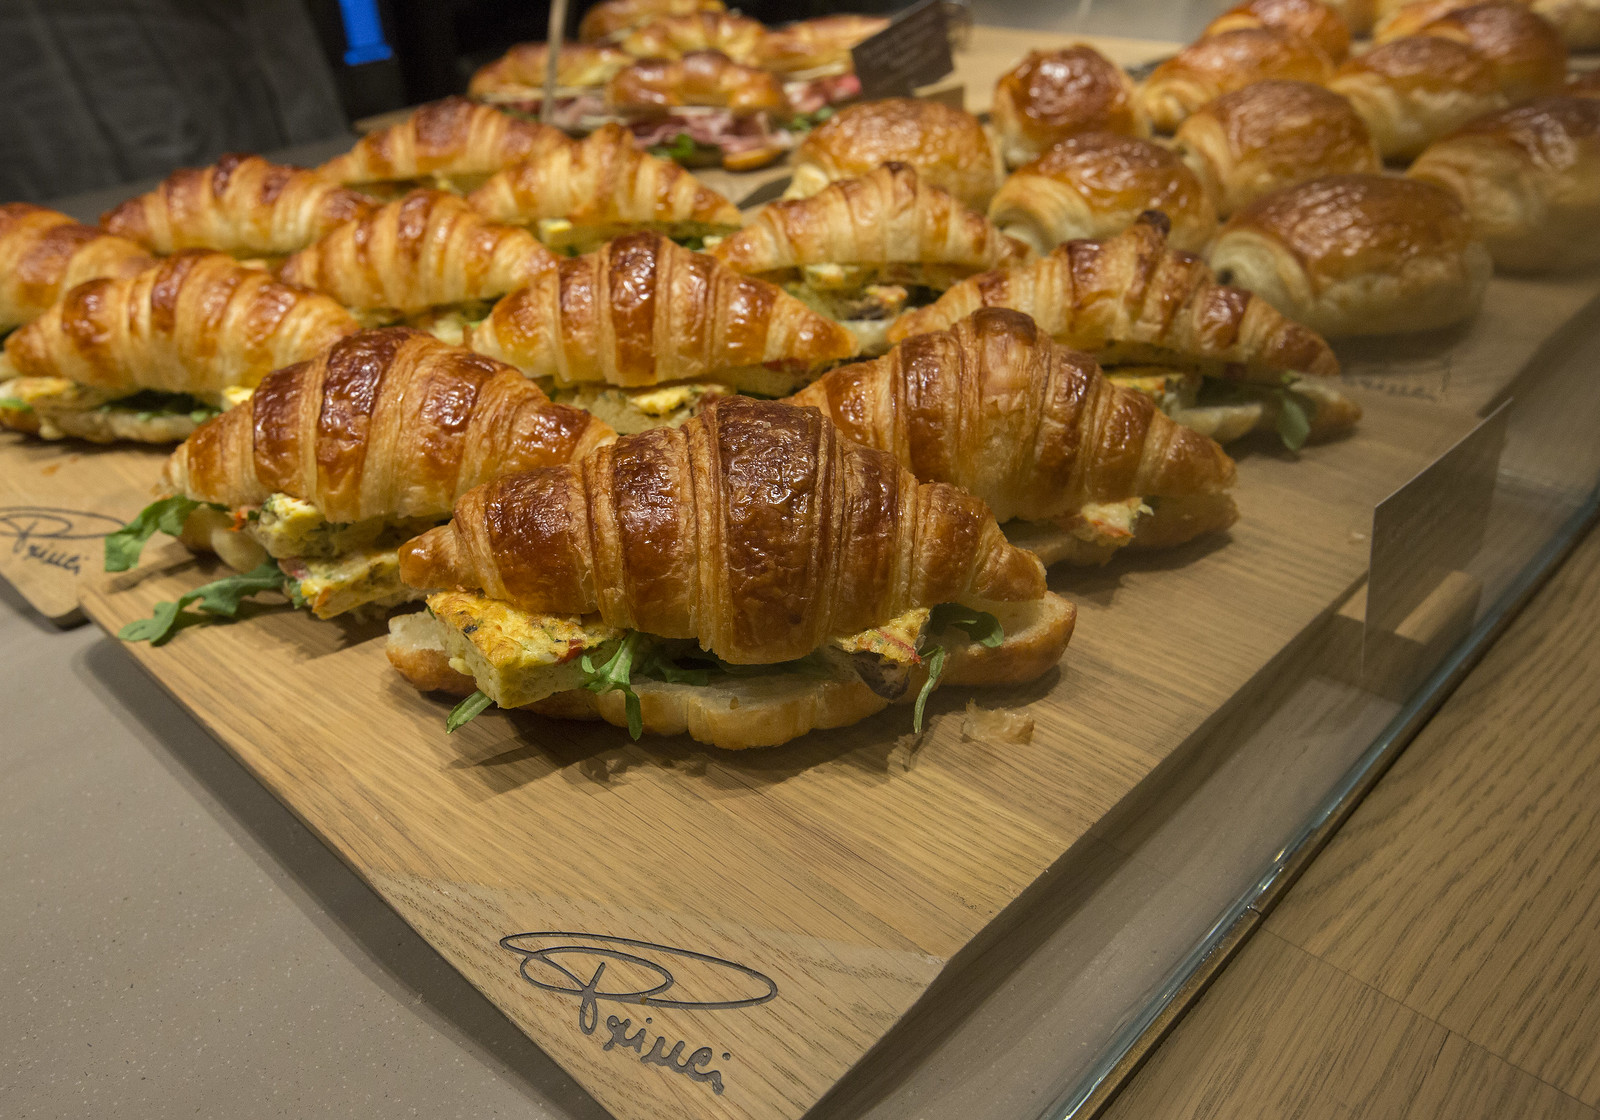 A croissant sandwich on a wooden platter.